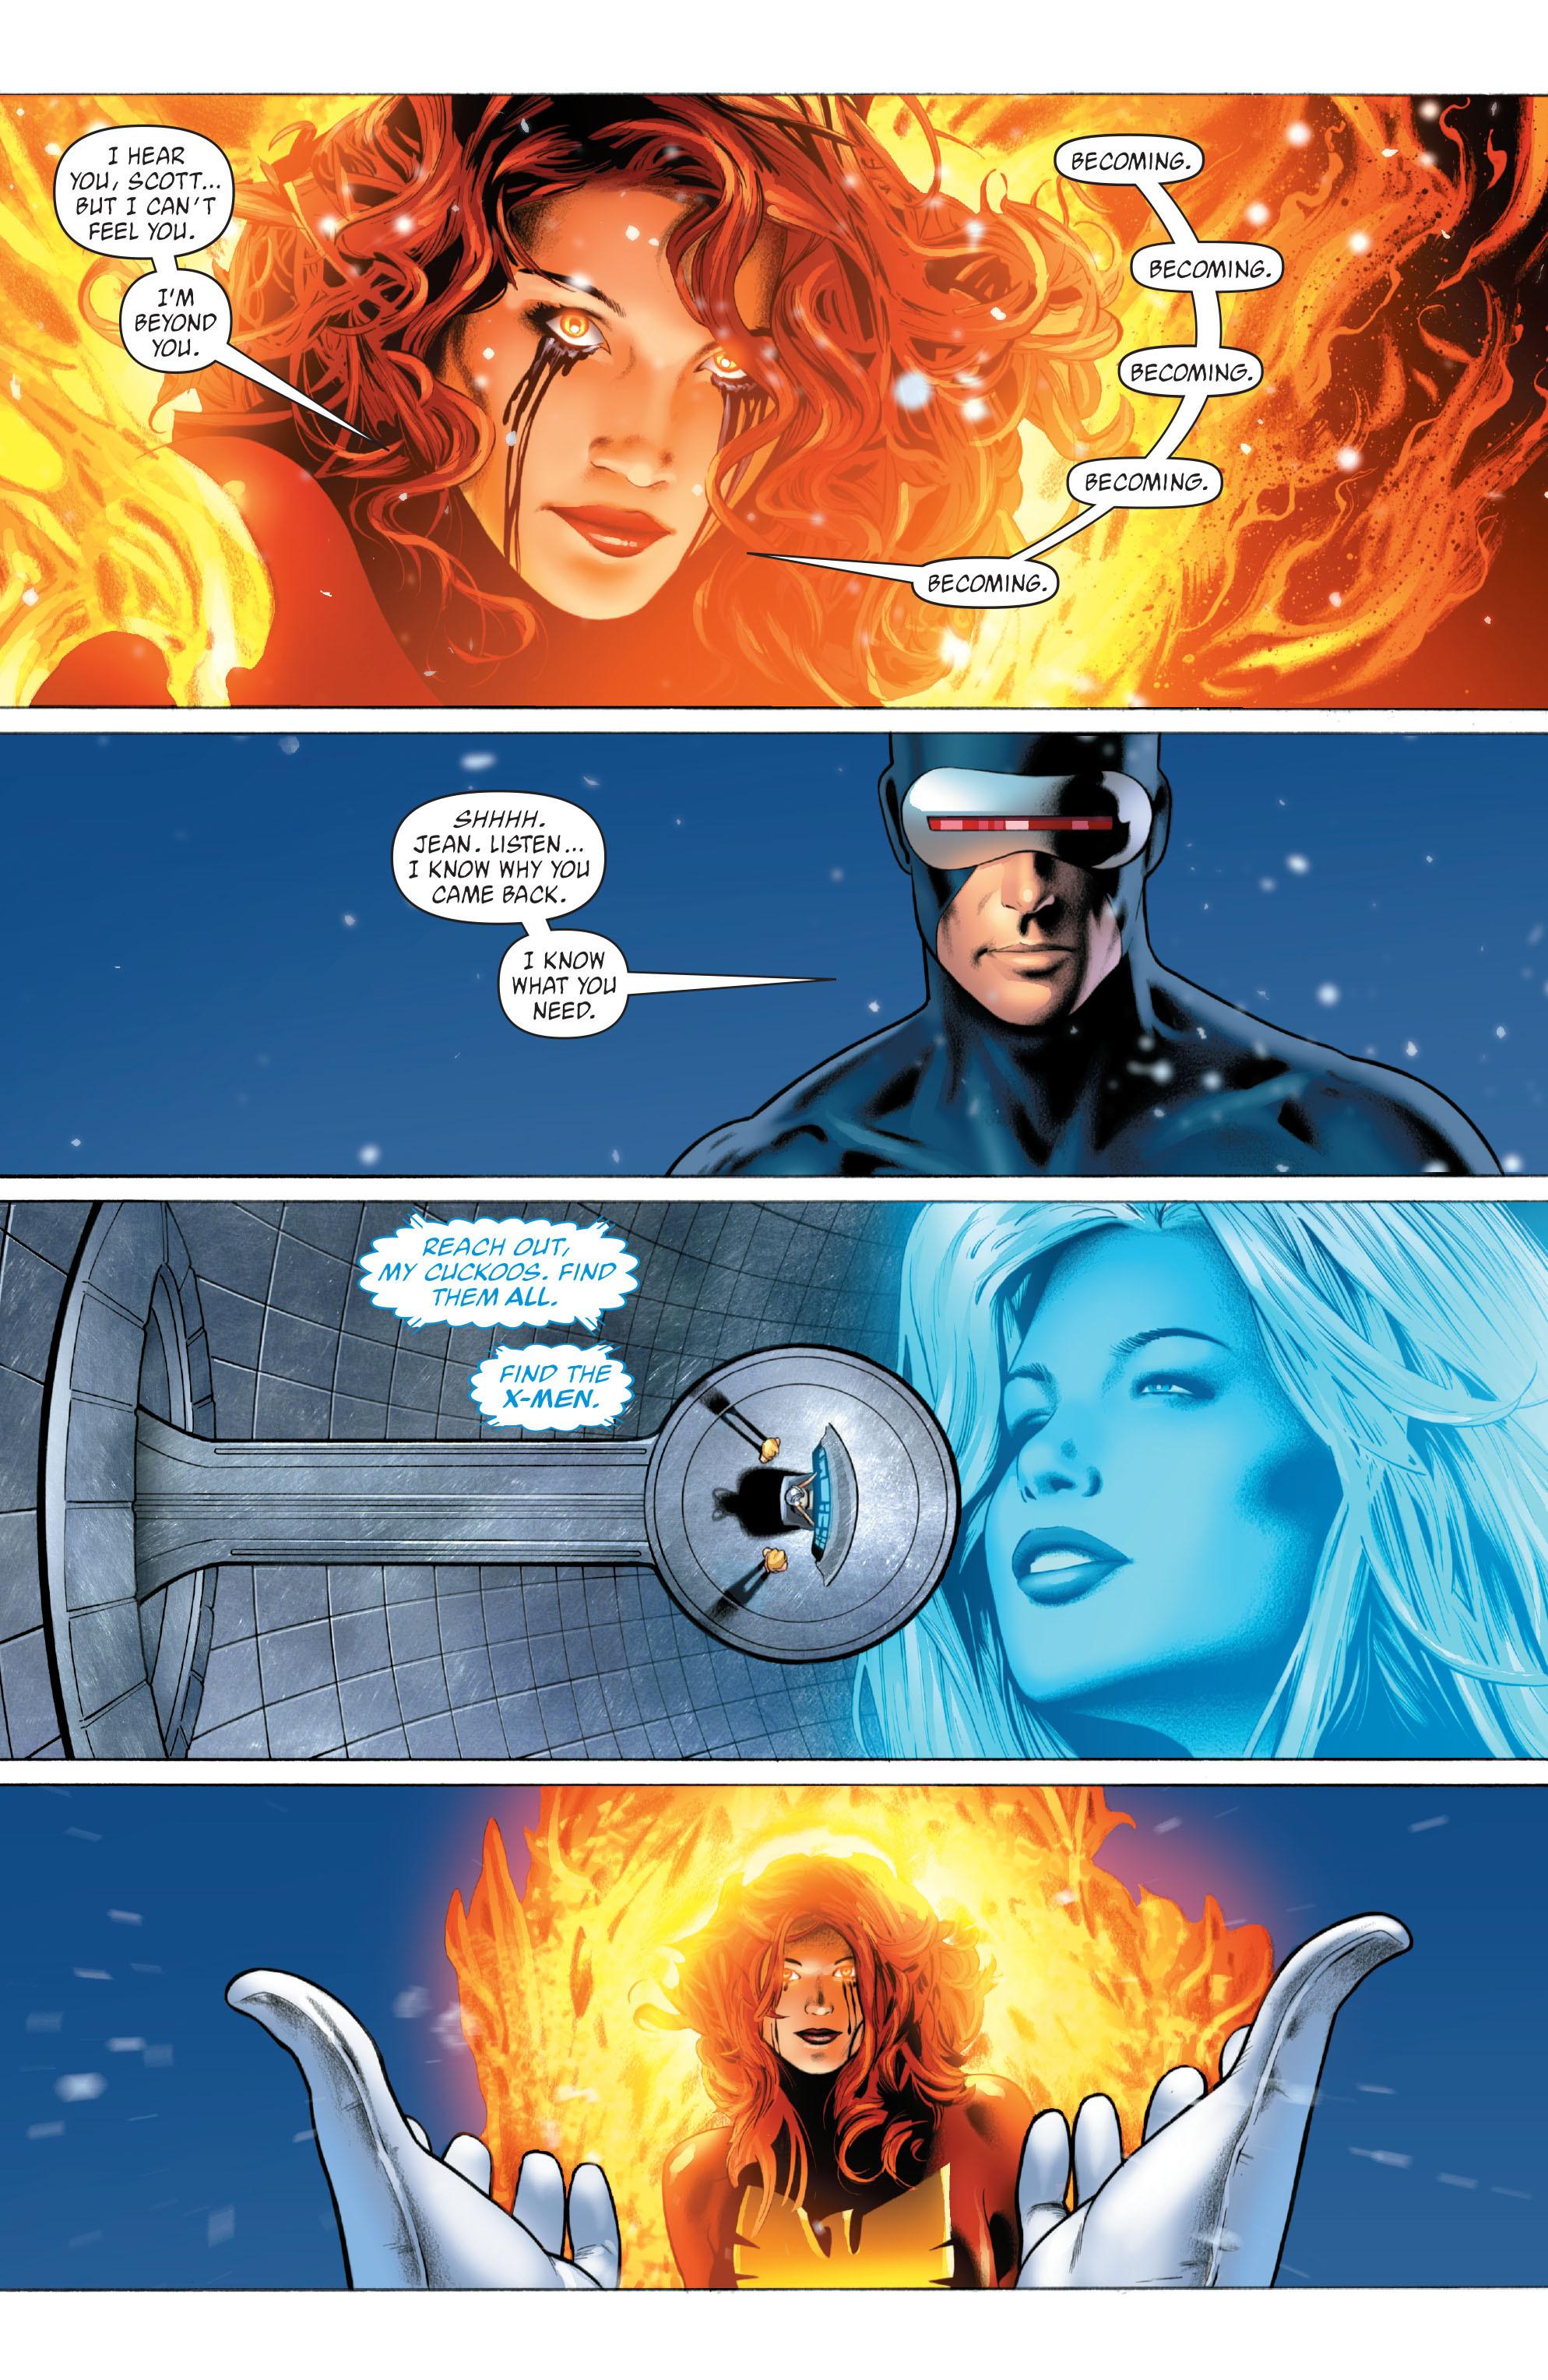 Read online X-Men: Phoenix - Endsong comic -  Issue #5 - 17